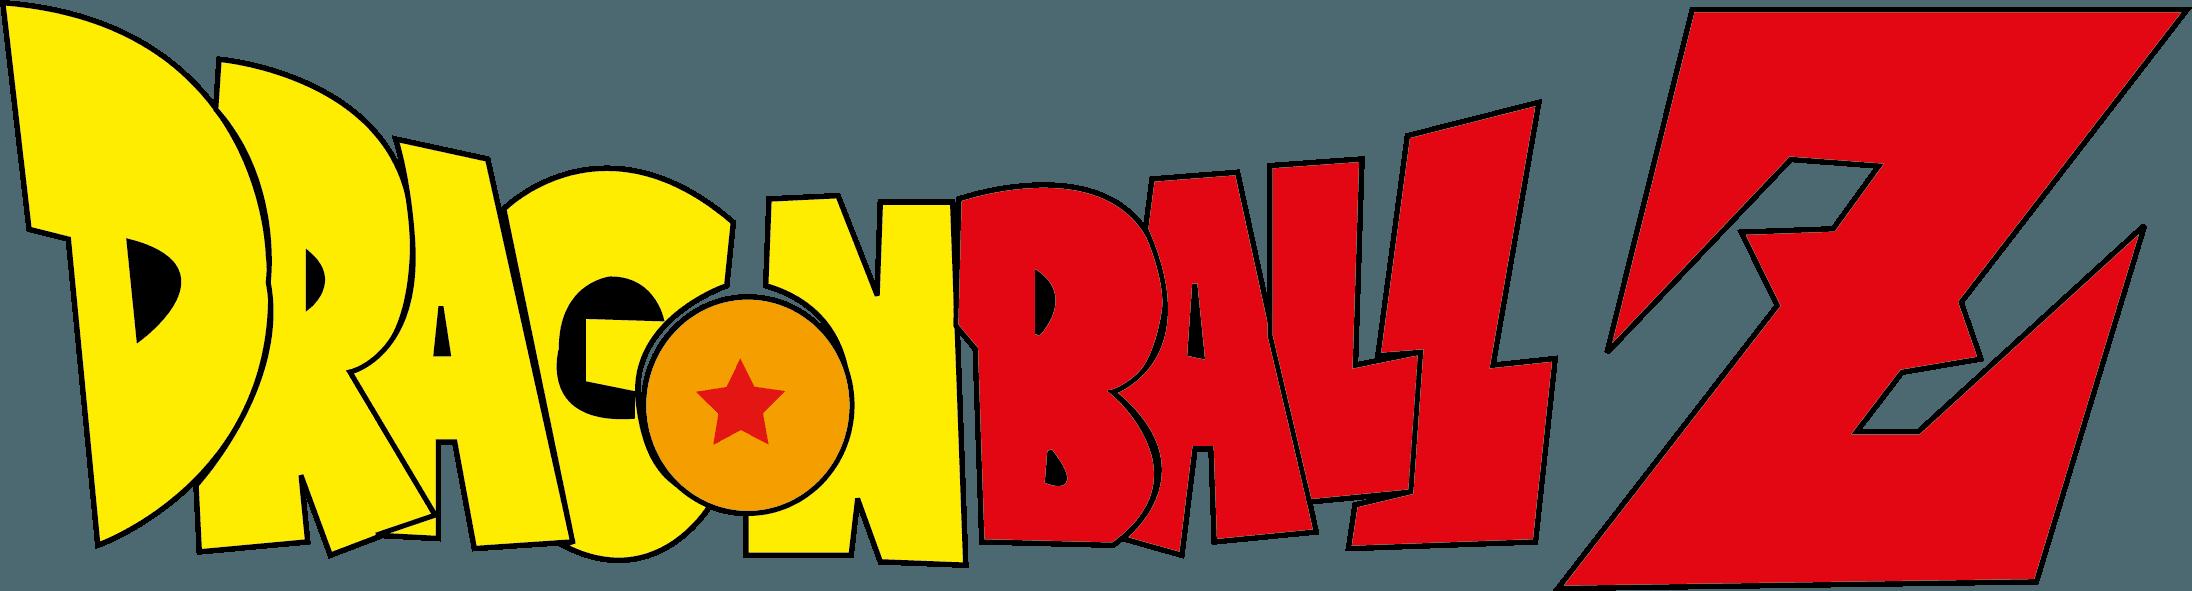 Dragon Ball Z Logo Vector EPS Free Download, Logo, Icons, Brand Emblems